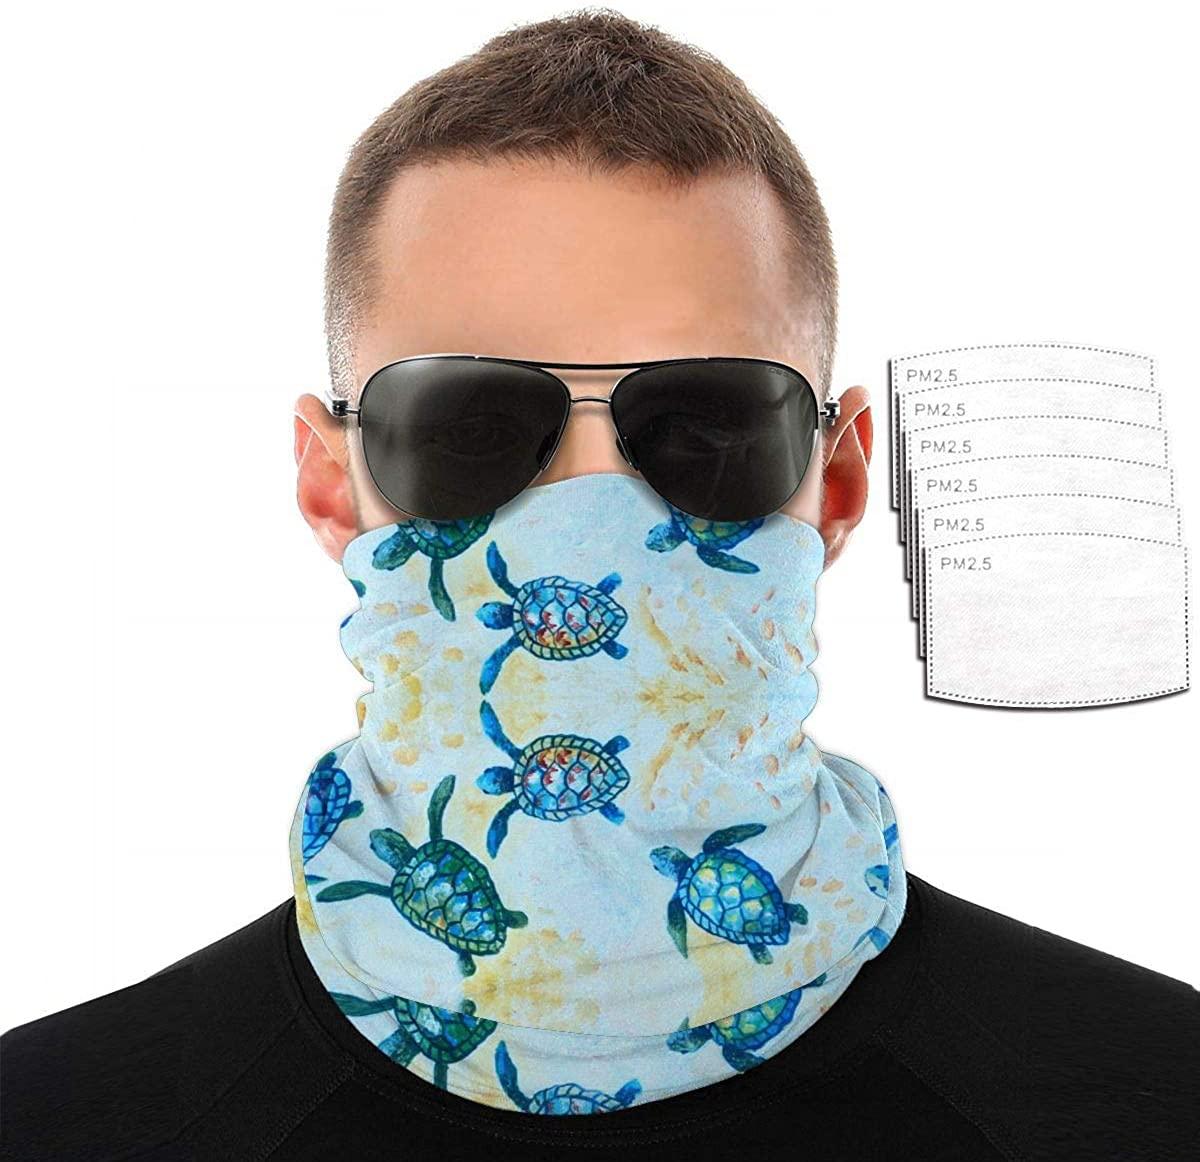 Unisex Bandanas Neck Gaiter Face Covering Mask Wind-Proof - Blue American Flag